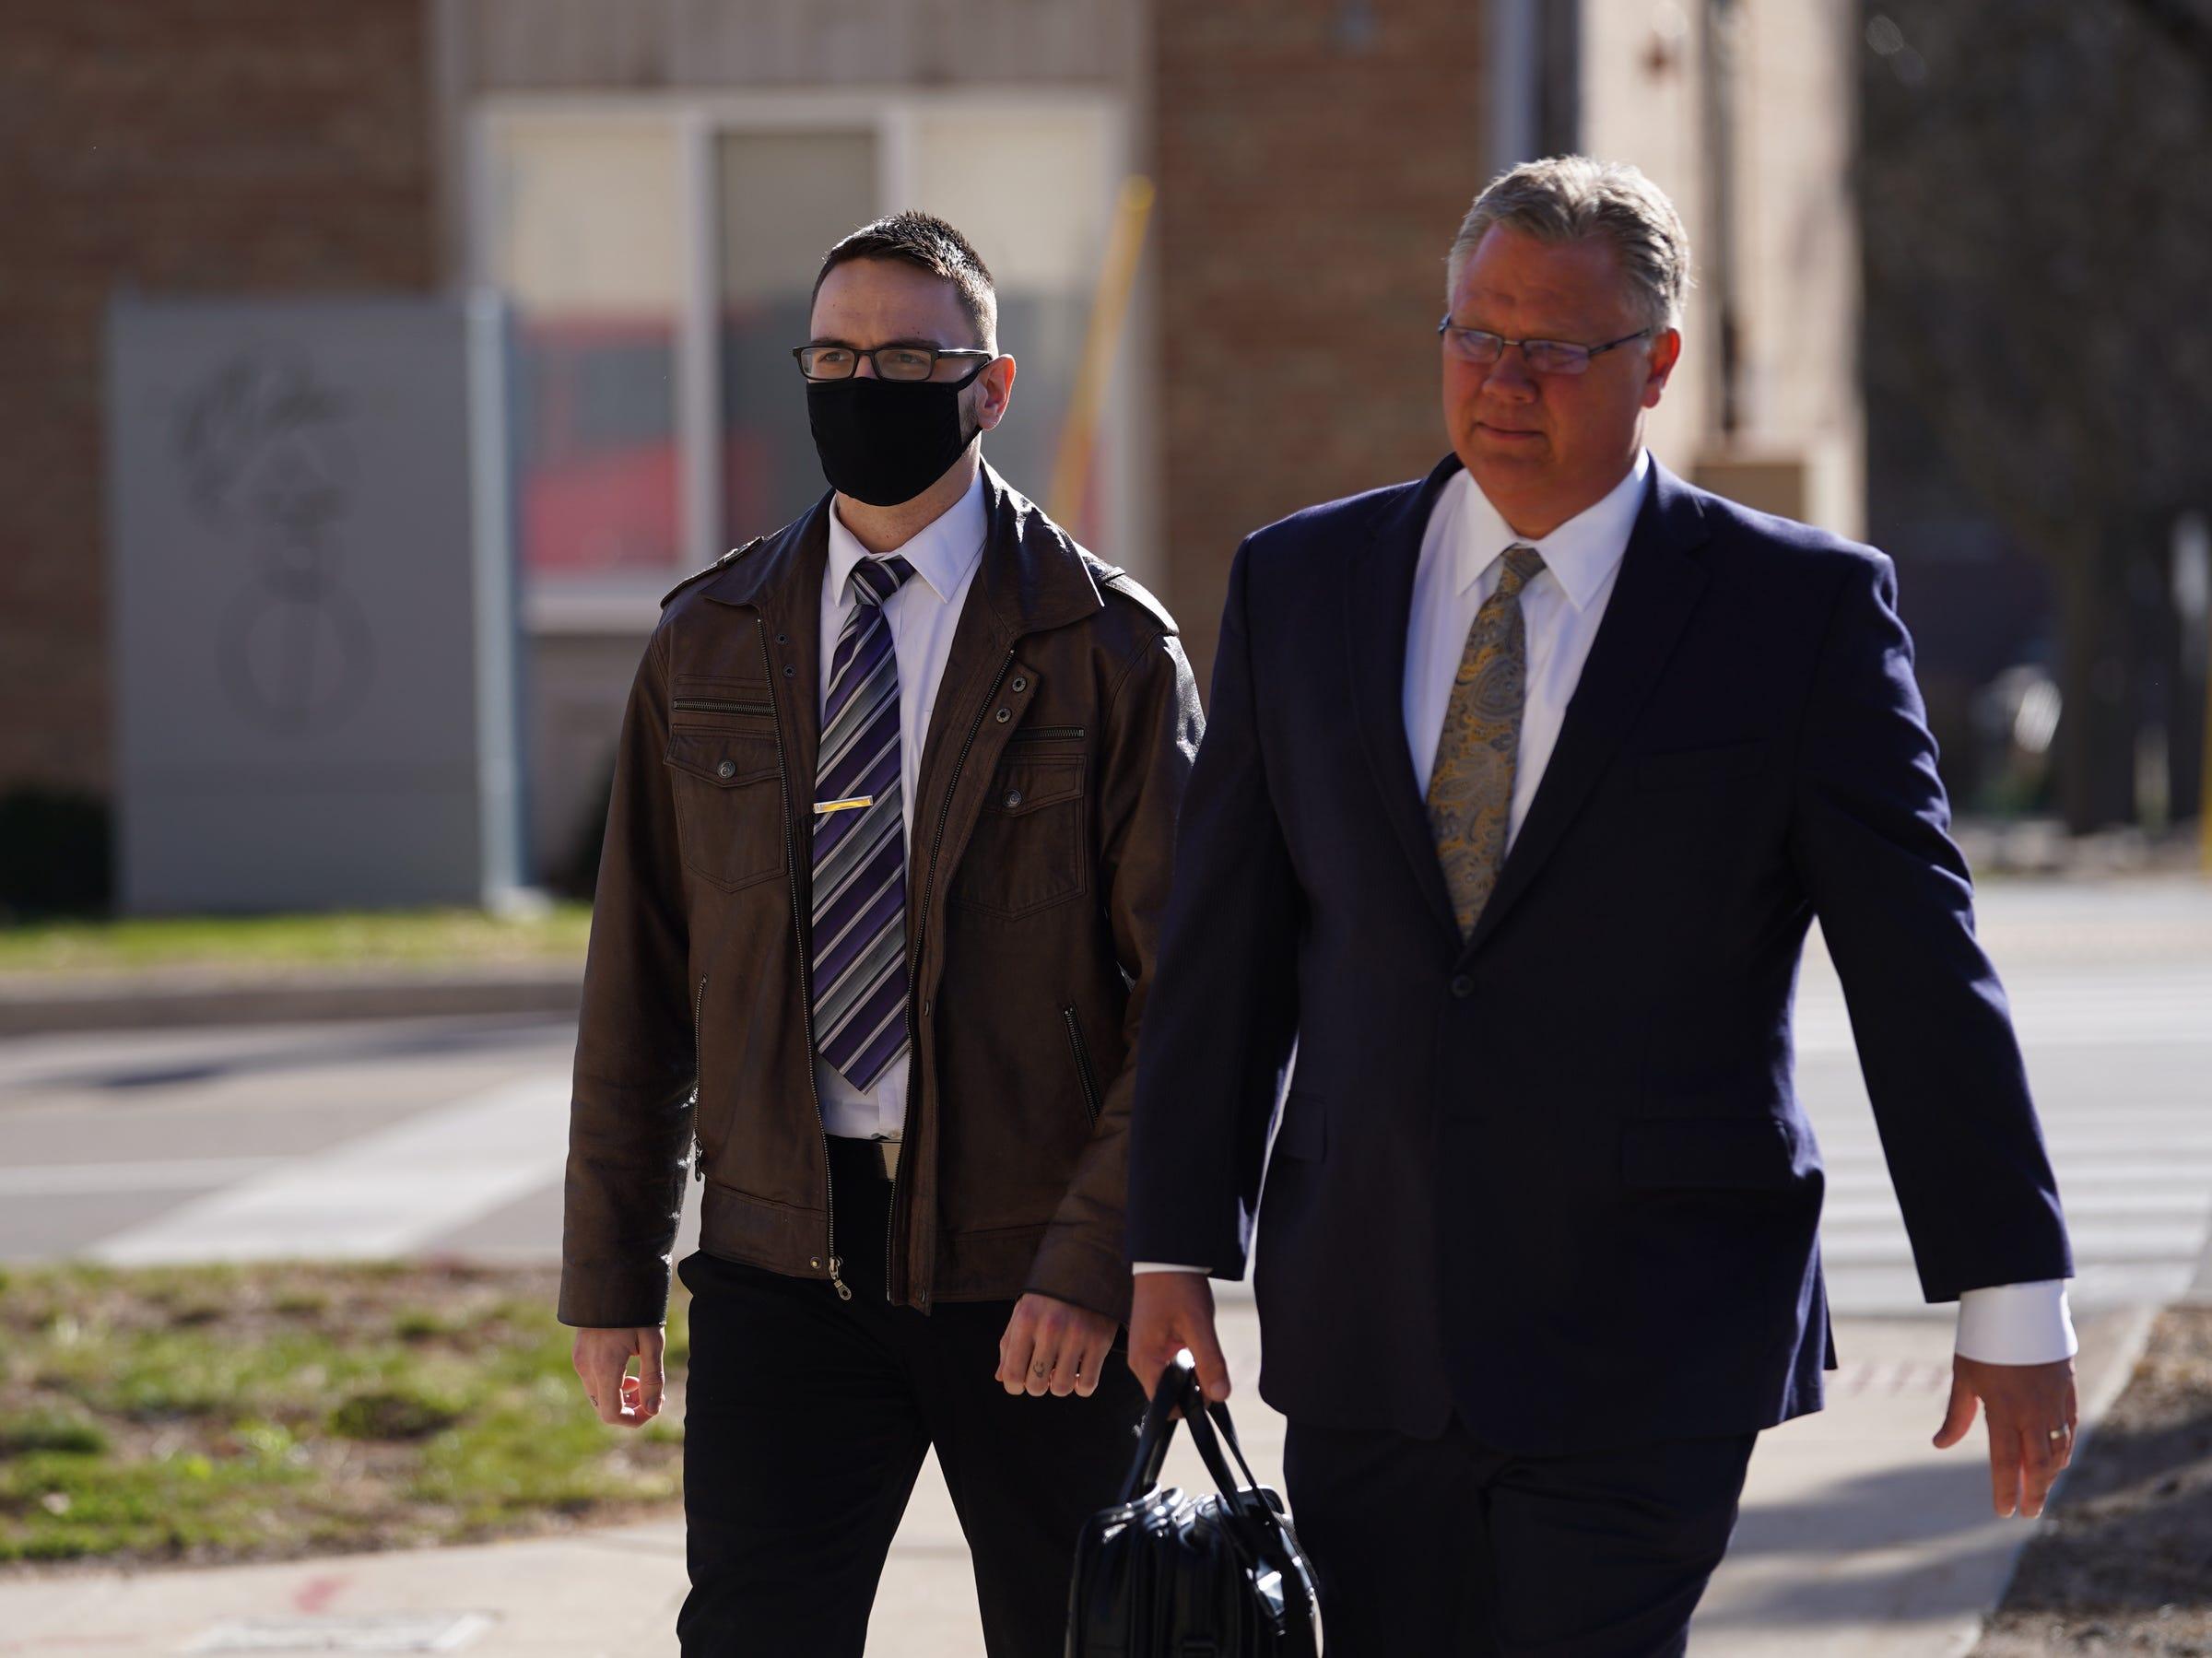 Michigan prosecutors: These messages show Whitmer plot defendants weren't entrapped